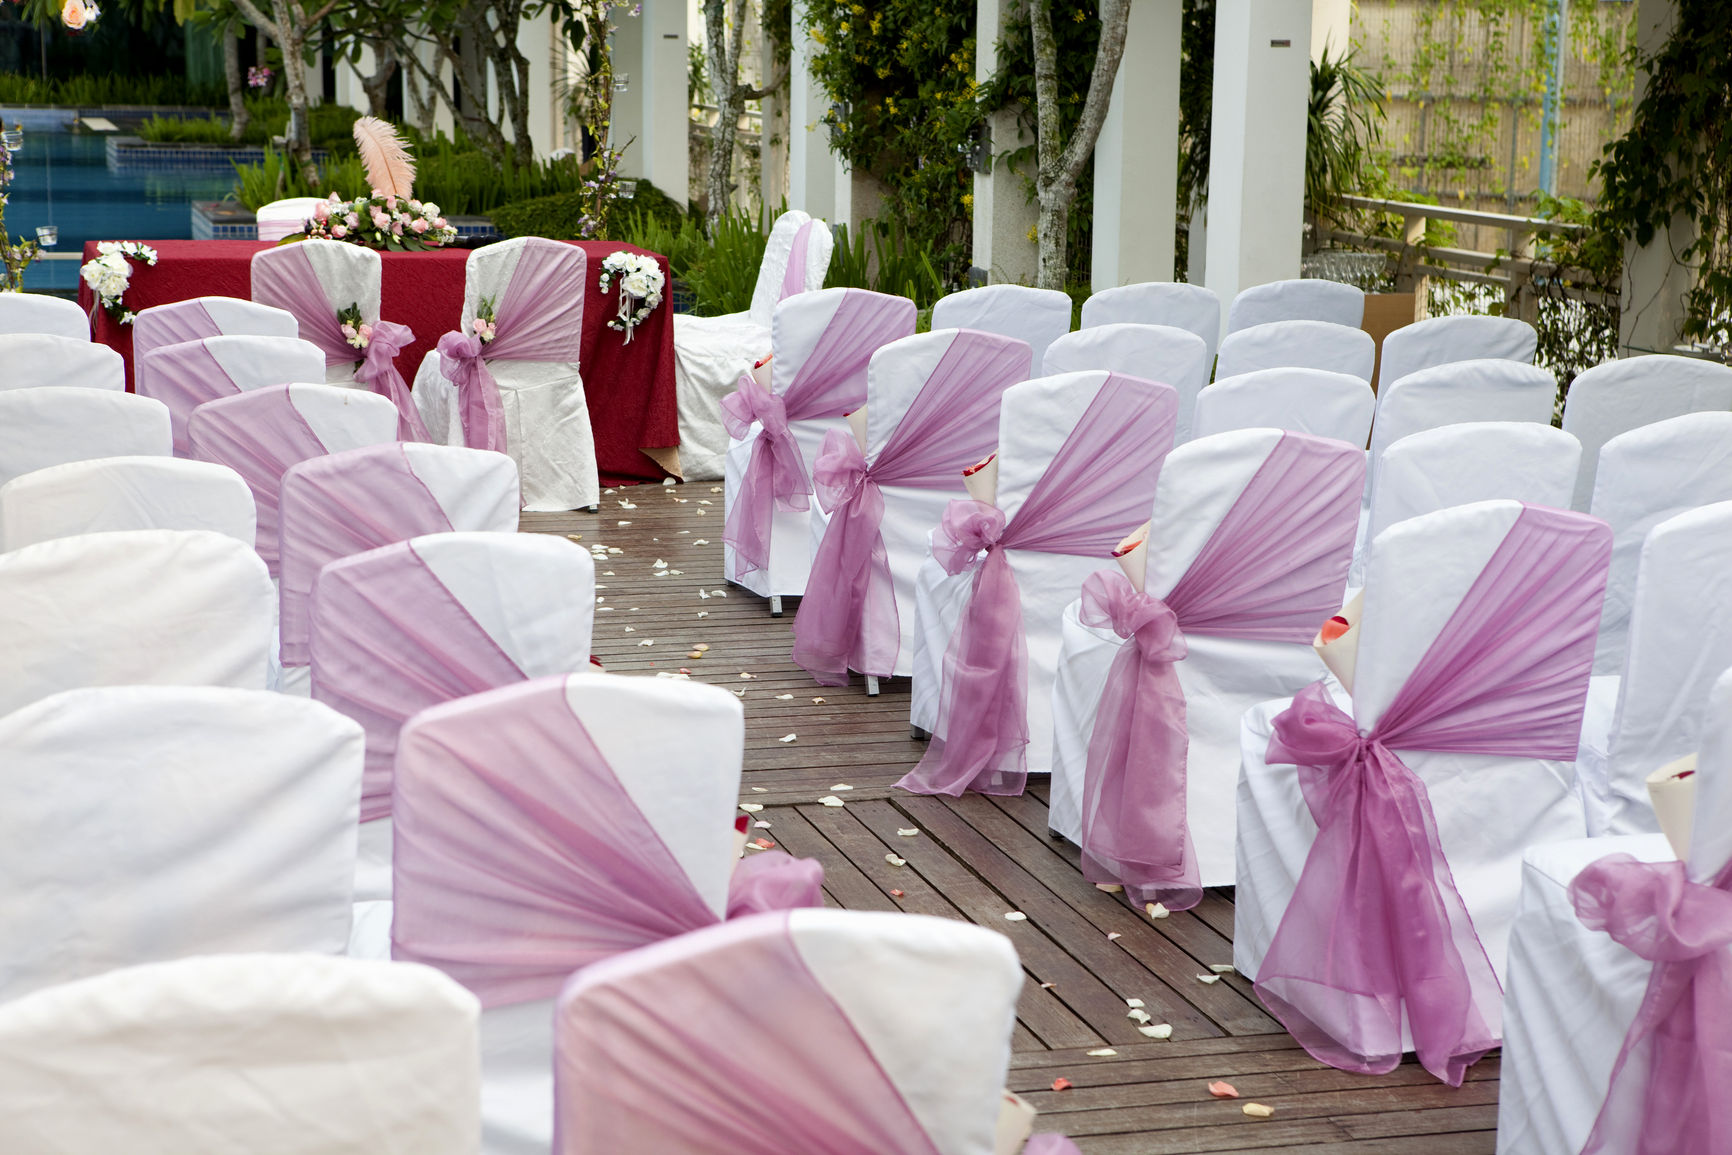 Outdoor Winter Decorating Ideas-winter-wonderland-wedding-theme-decorations-winter-wonderland-wedding-theme